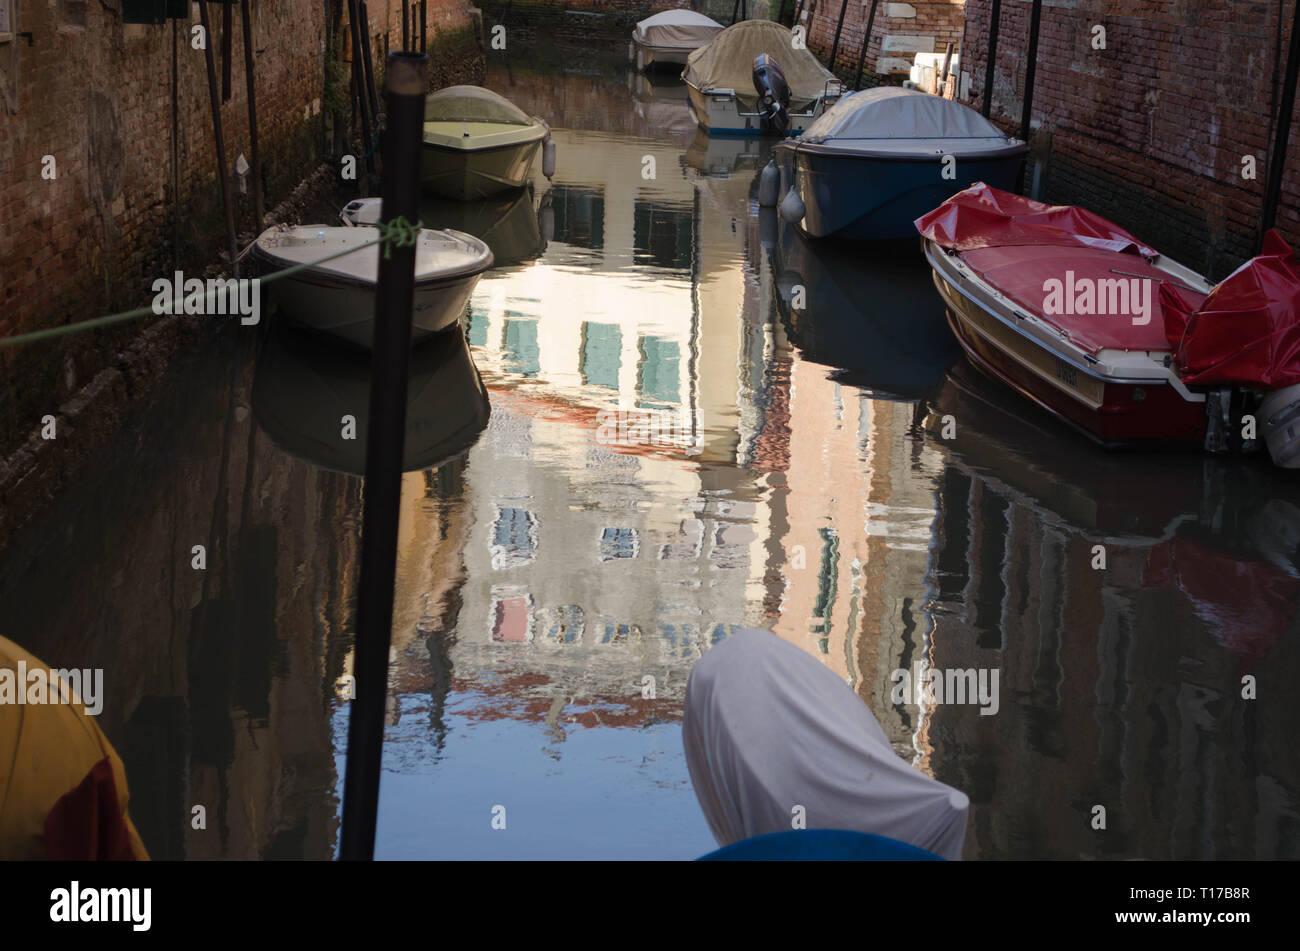 venezia fotografia panoramica riflessi nel acqua Stock Photo